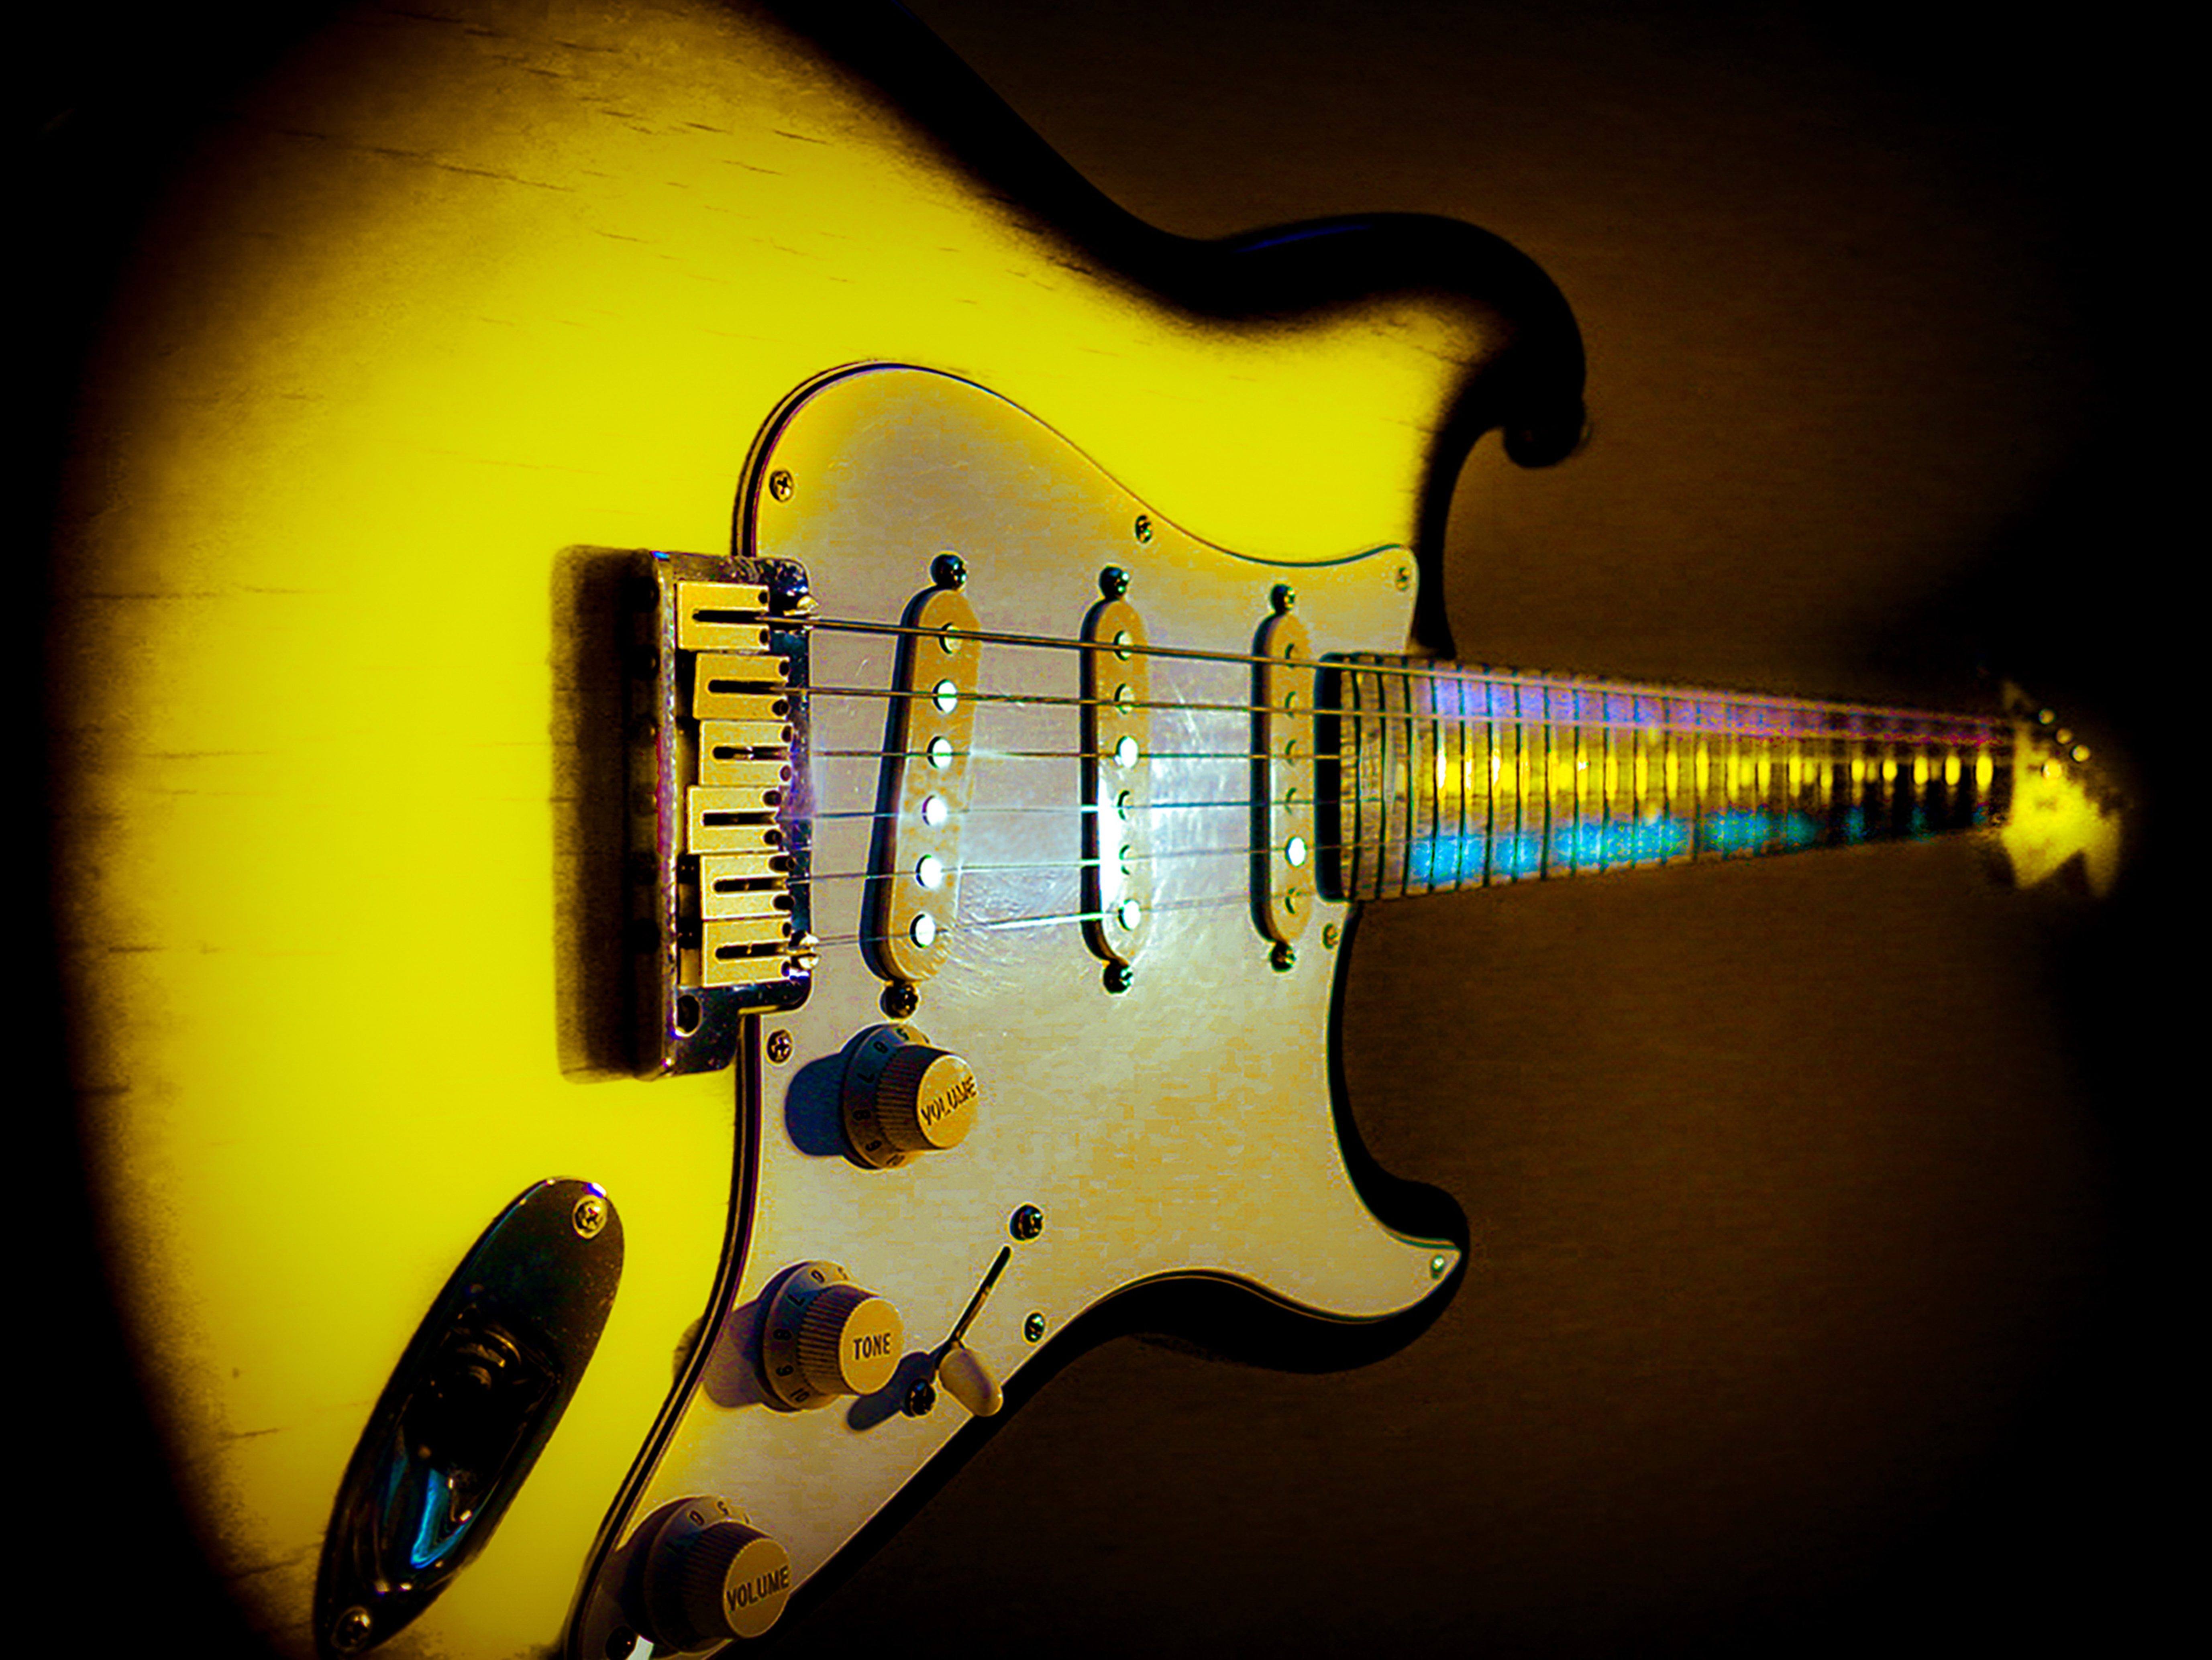 Fender Stratocaster Yellow Guitarwacky.com